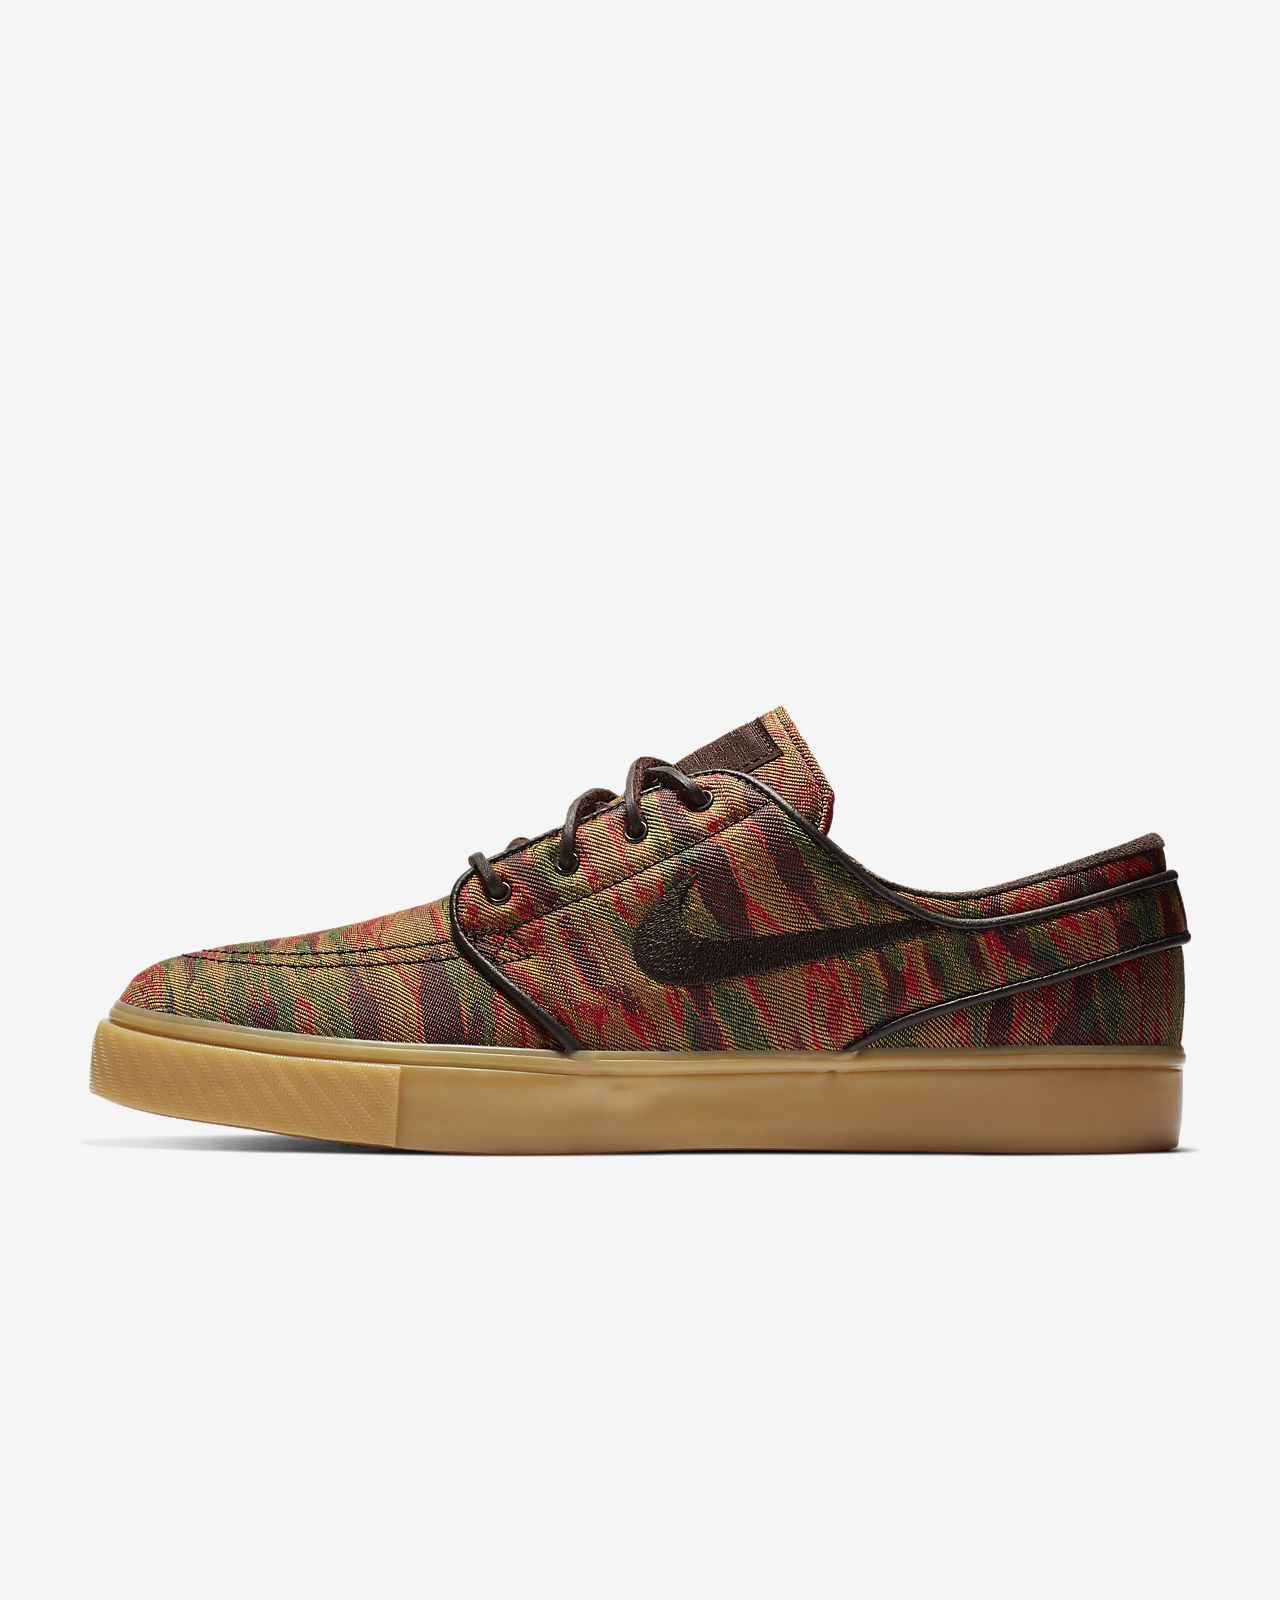 ddf14d50ac3 ... Sapatilhas de skateboard Nike SB Zoom Stefan Janoski Canvas Premium  para homem